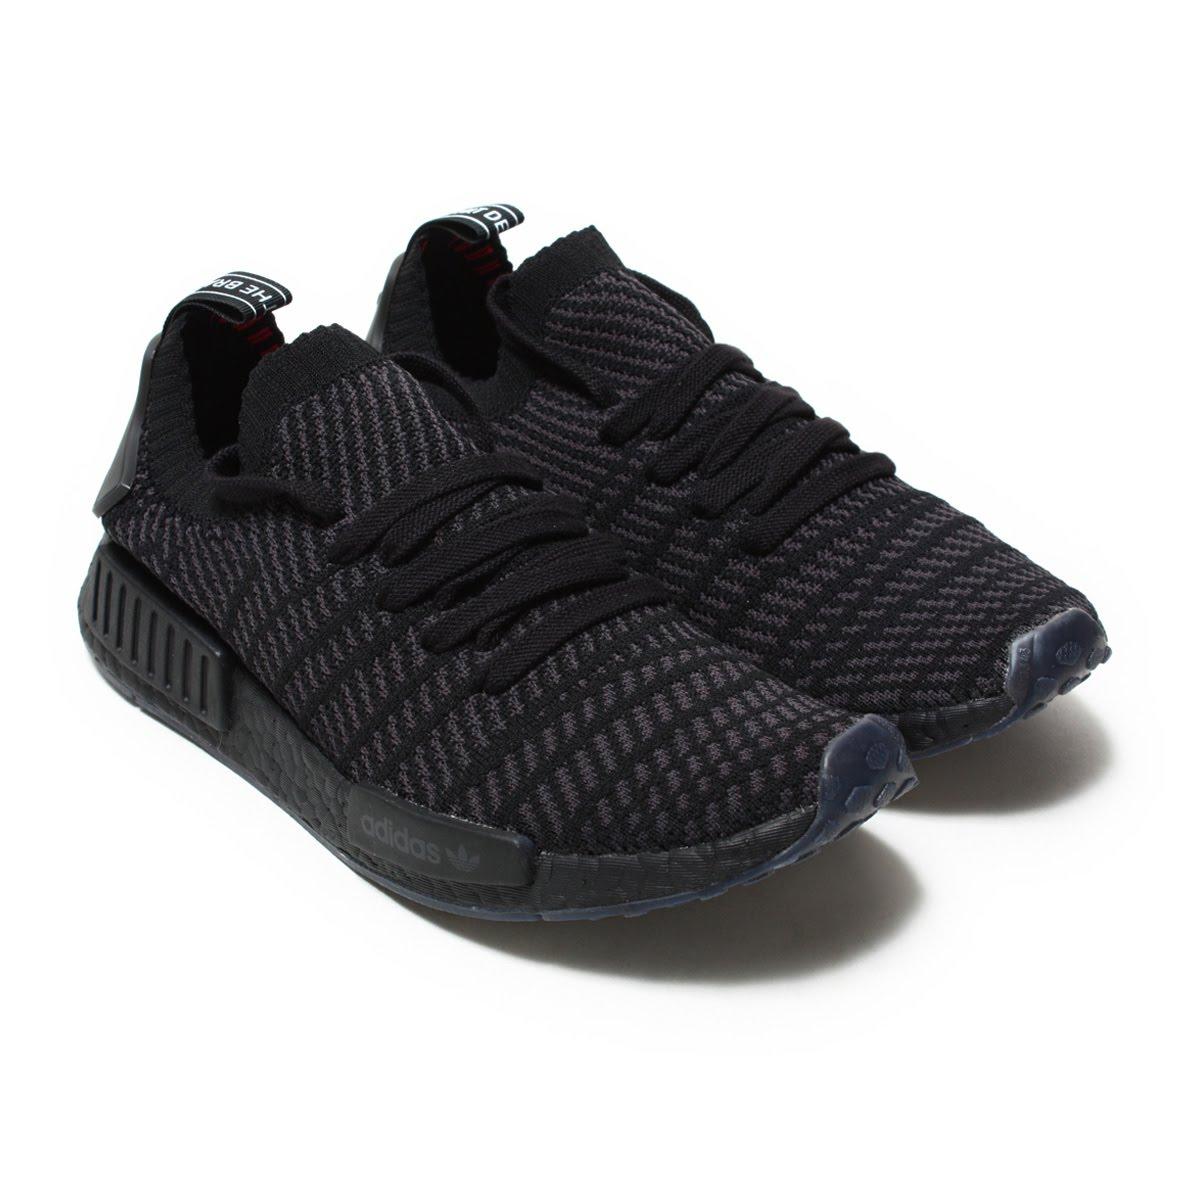 size 40 fa402 dffb3 adidas Originals NMD_R1 STLT PK (Adidas originals N M D R1 STLT PK) Core  Black/Utility Black/Solar Pink 18SS-I